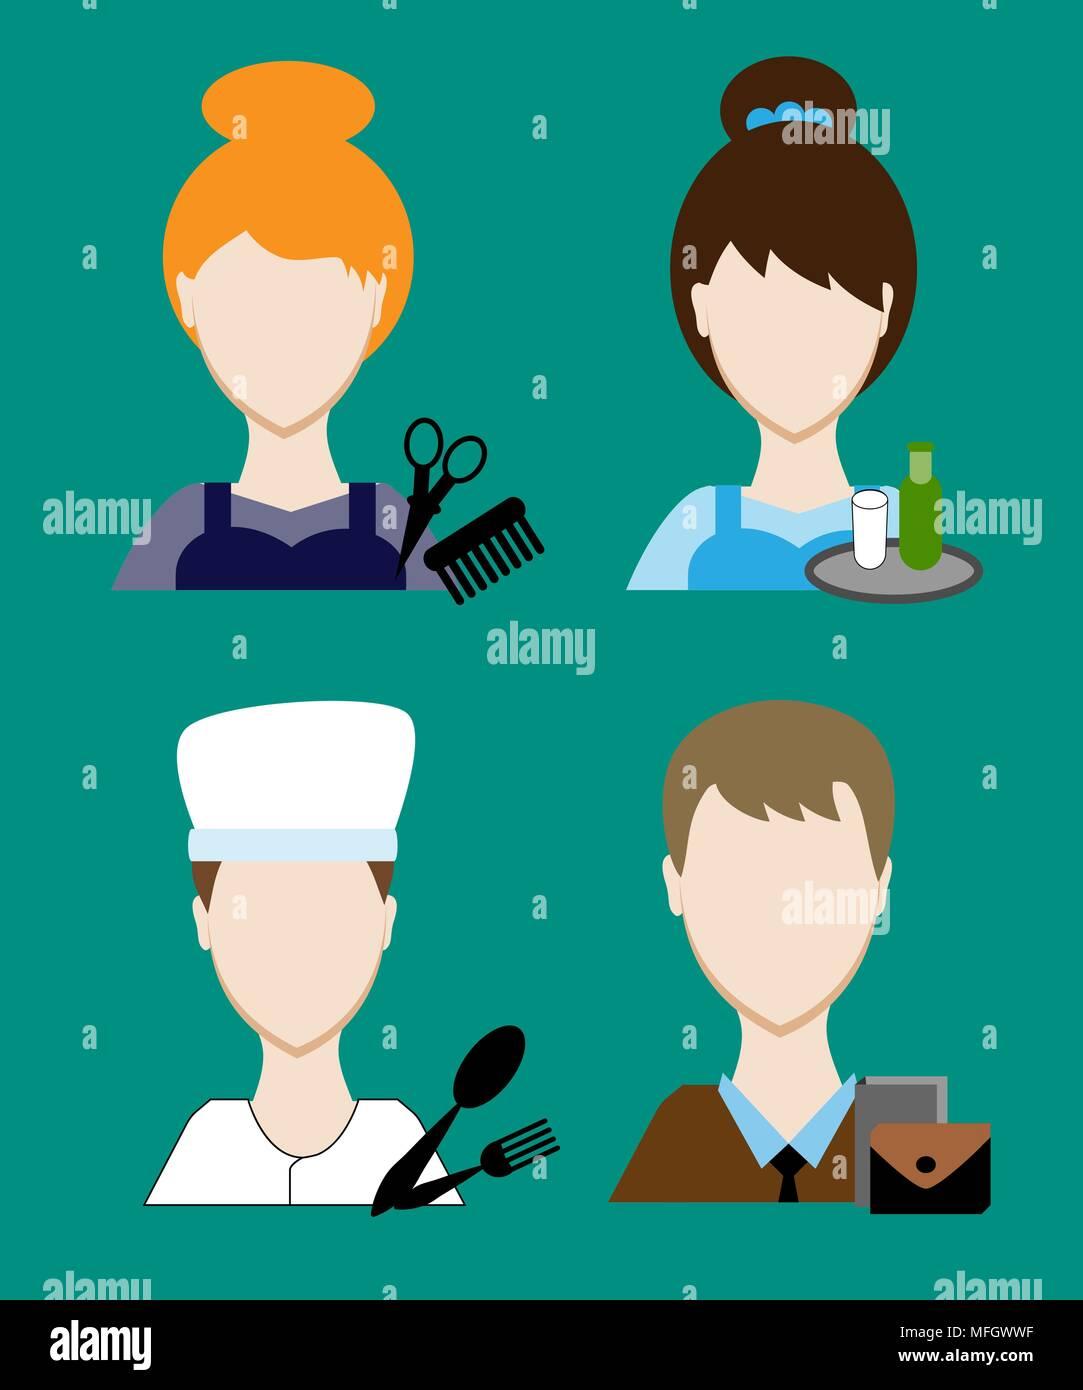 Profession people cook, hairdresser, teacher, waiter a businessman, secretary. Face men uniform. Avatars in flat design. Vector illustration - Stock Vector